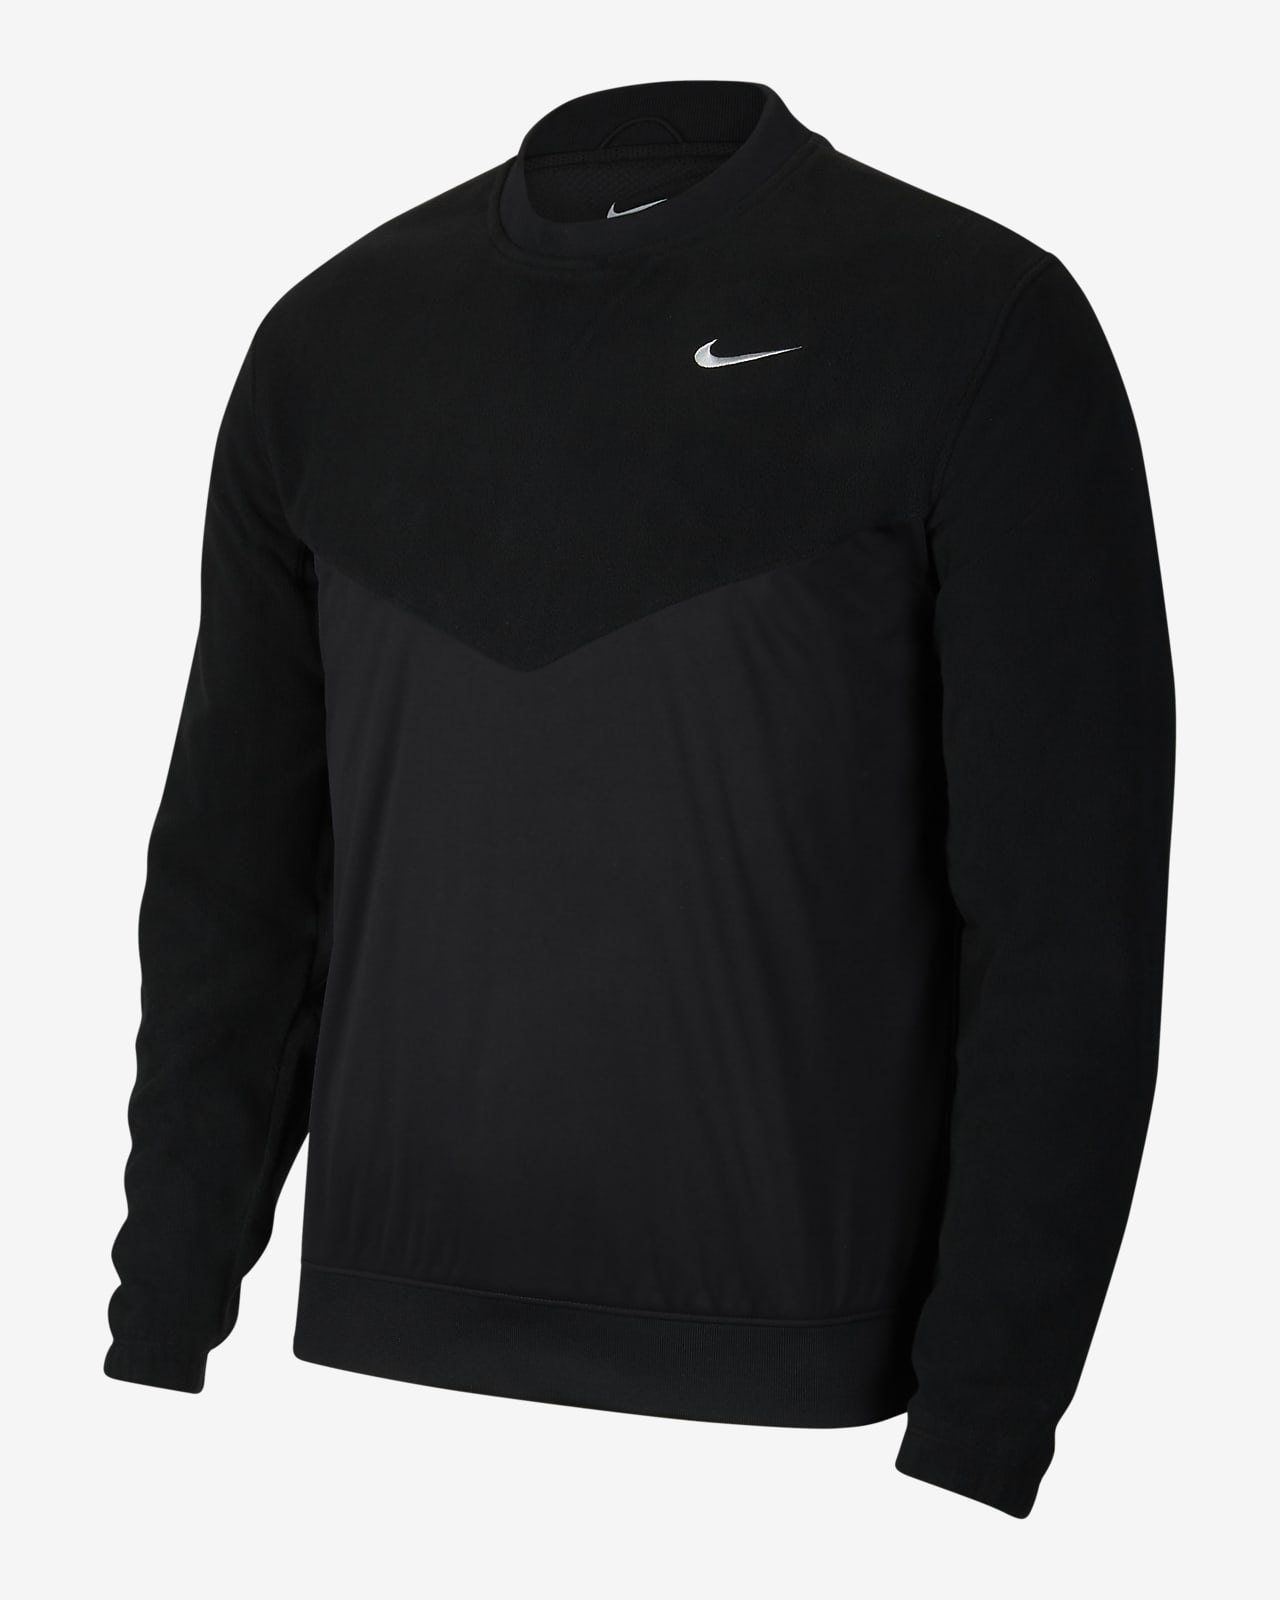 Nike Therma Men's Golf Crew